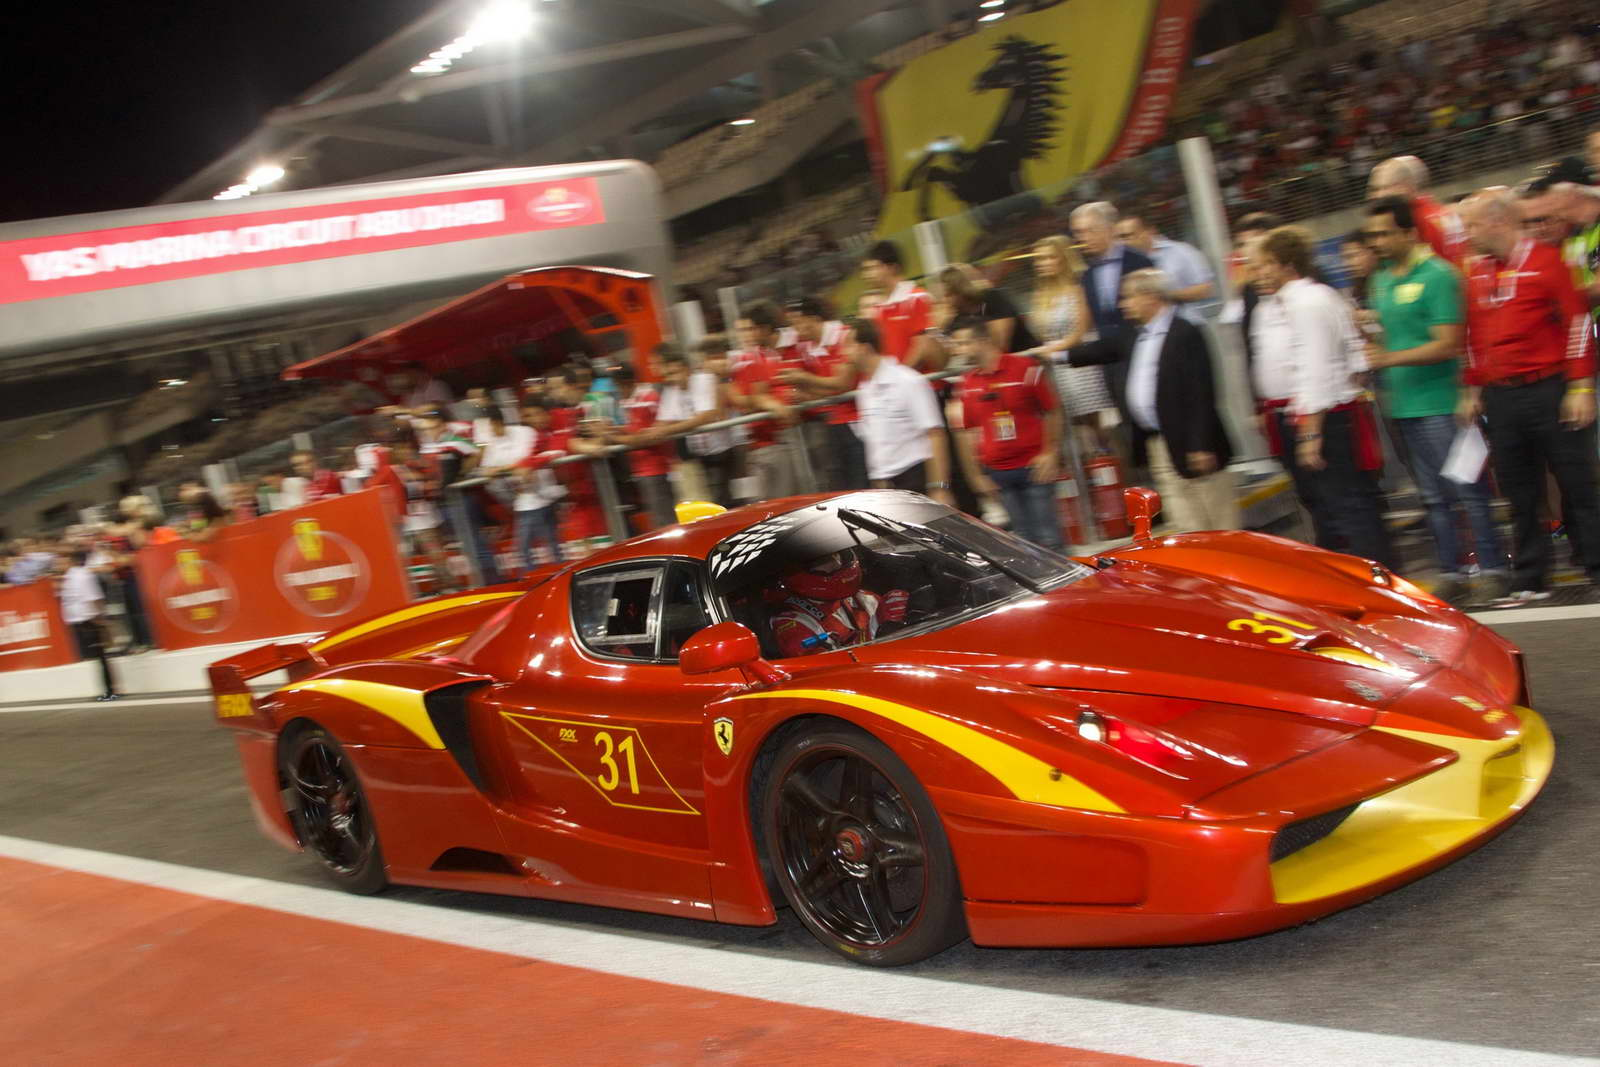 Perfect 10: More Videos and Pics of Ferrari FXX K Launch